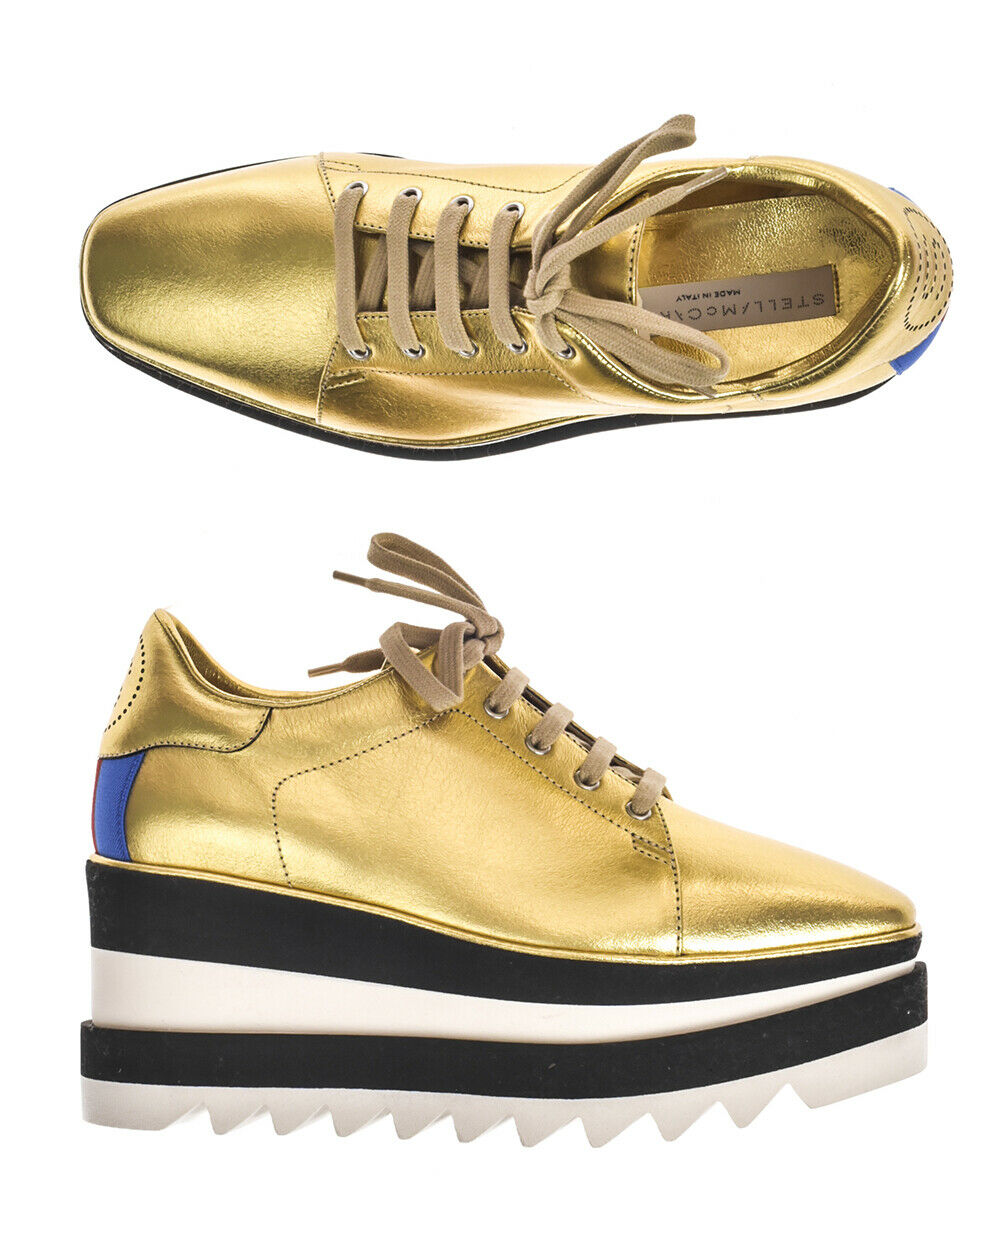 Stella McCartney scarpe da ginnastica ELYSE Donna oro 478958W1C3 8095  S36,5 MAKEOFFER  elementi di novità